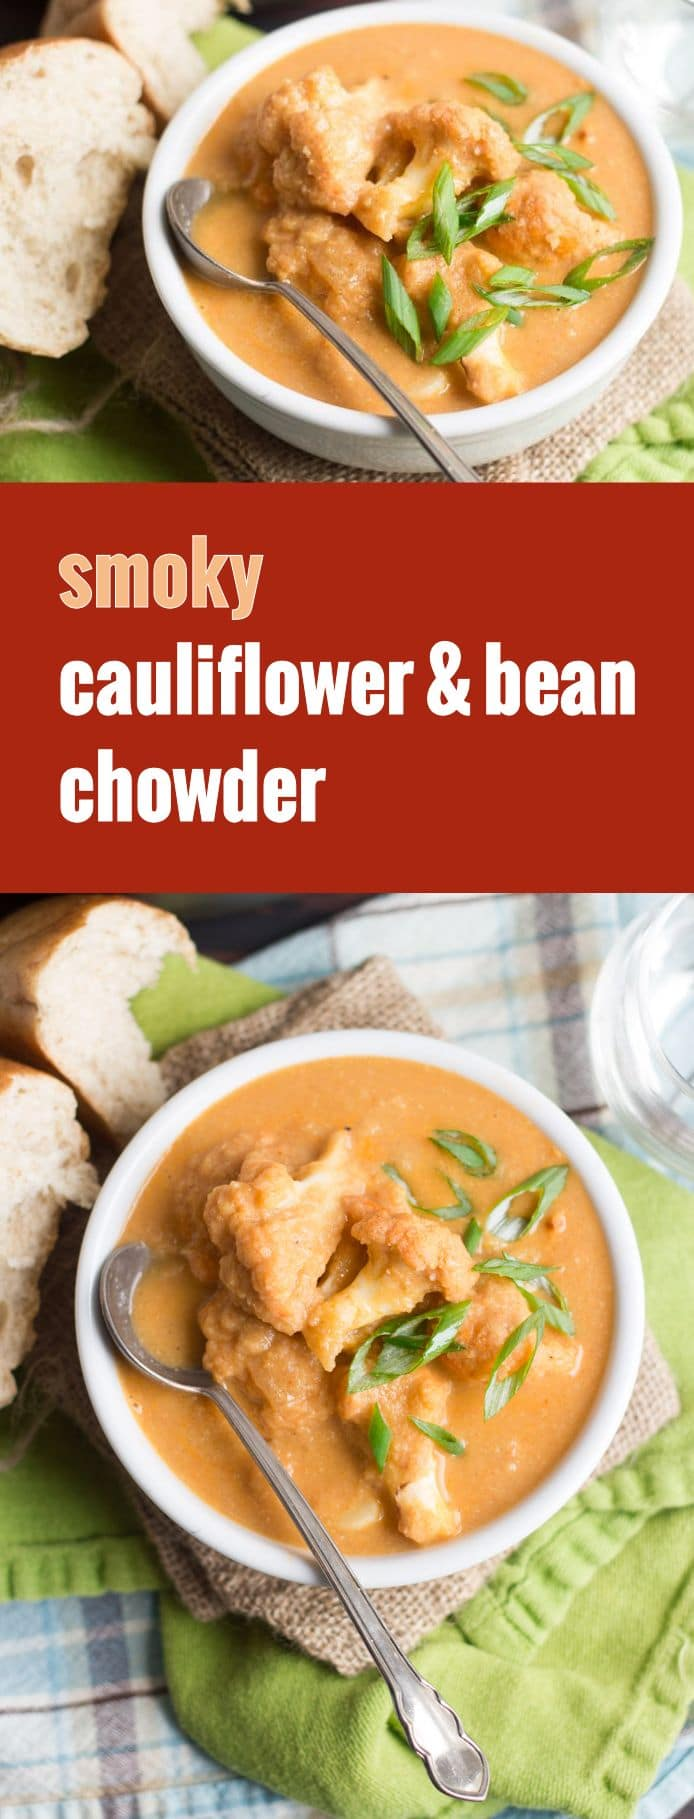 Smoky White Bean & Cauliflower Chowder